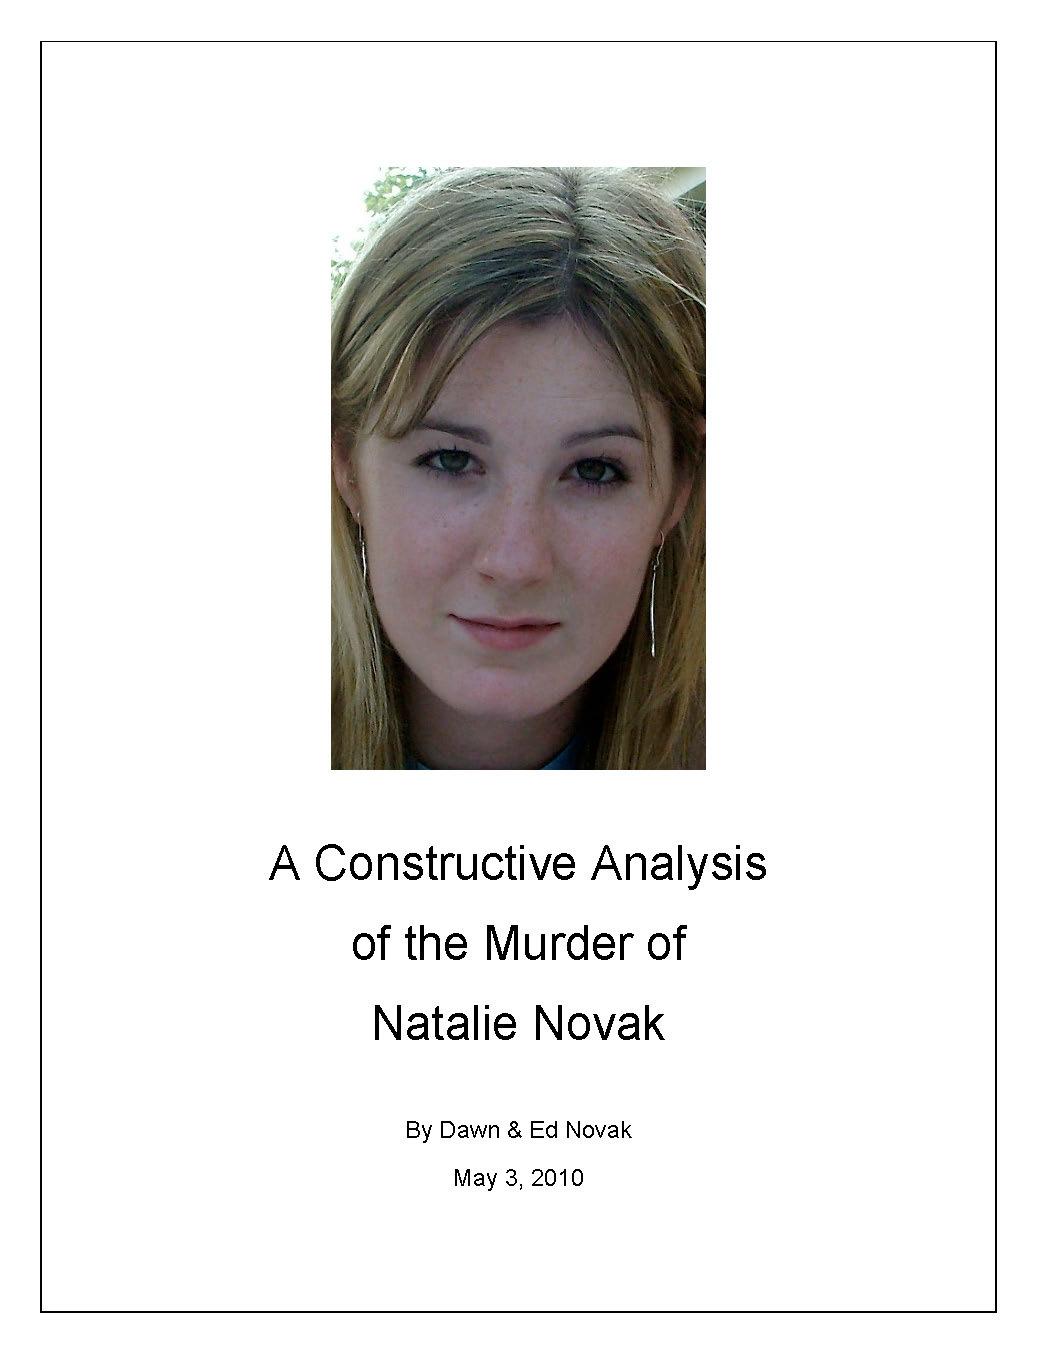 A Constructive Analysis of the Murder of Natalie Novak